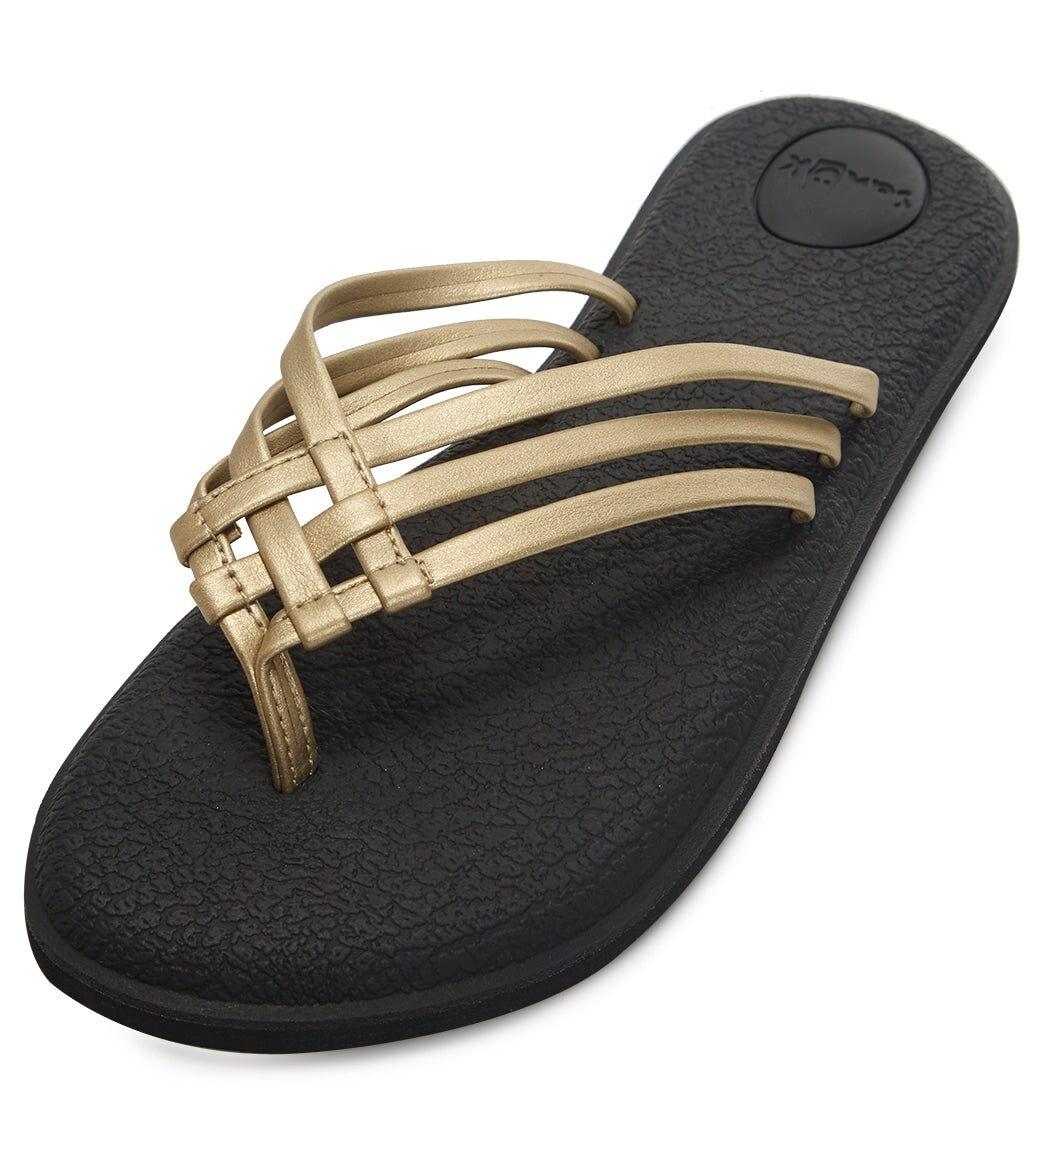 Sanuk Women's Yoga Salty Metallic Sandal - Champagne 10